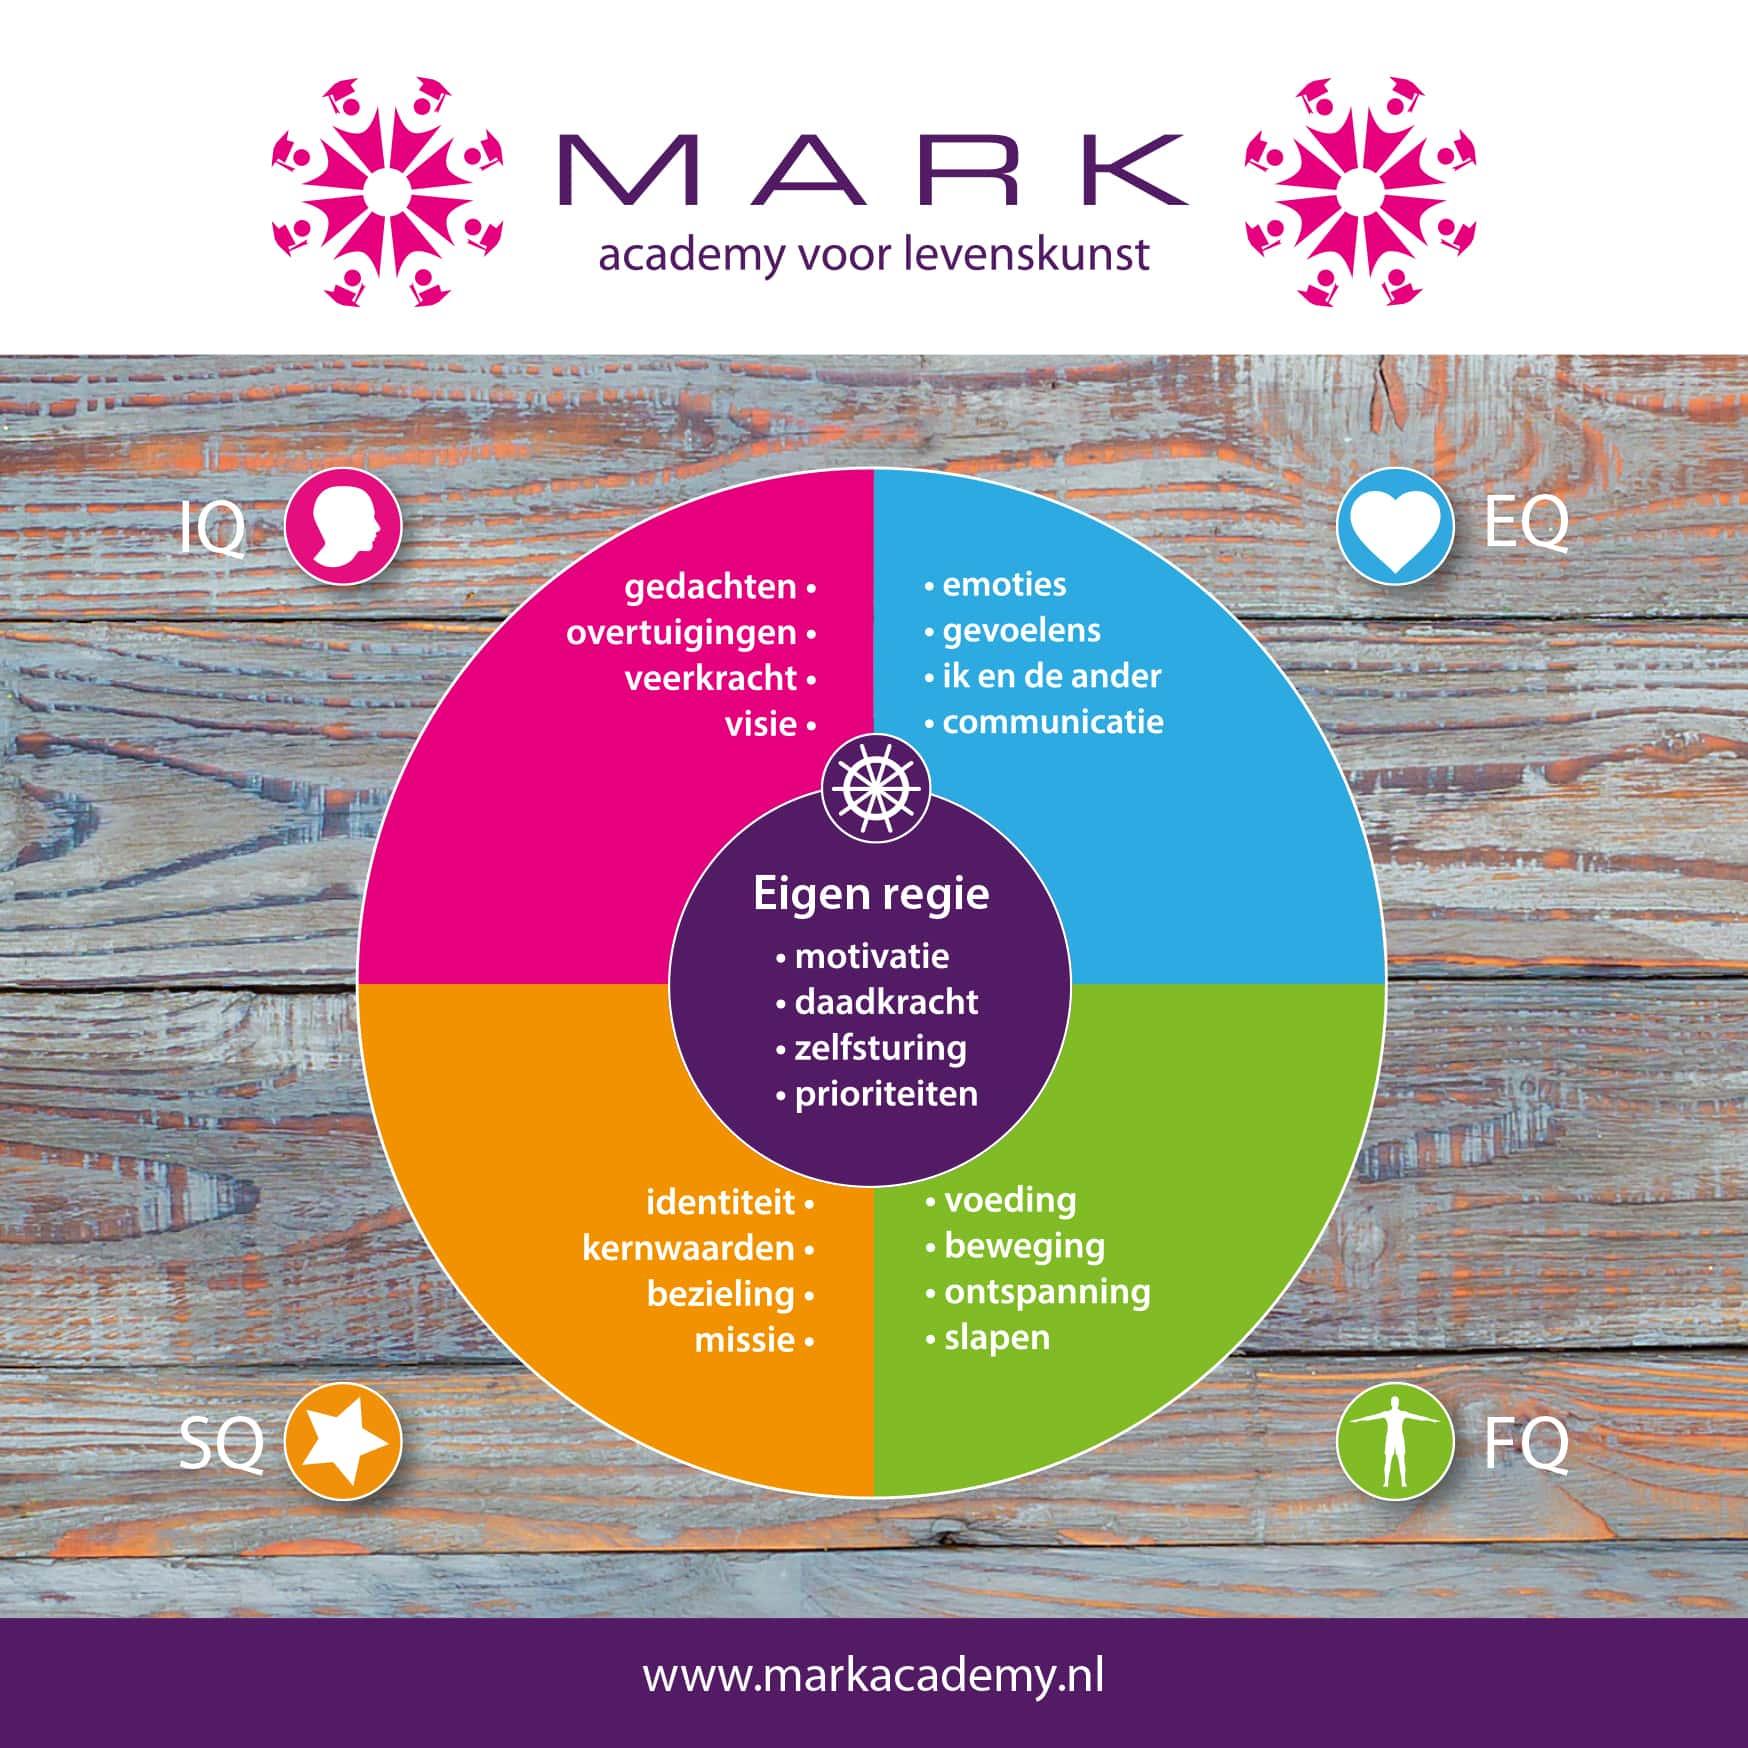 Integraal Mark Balansmodel